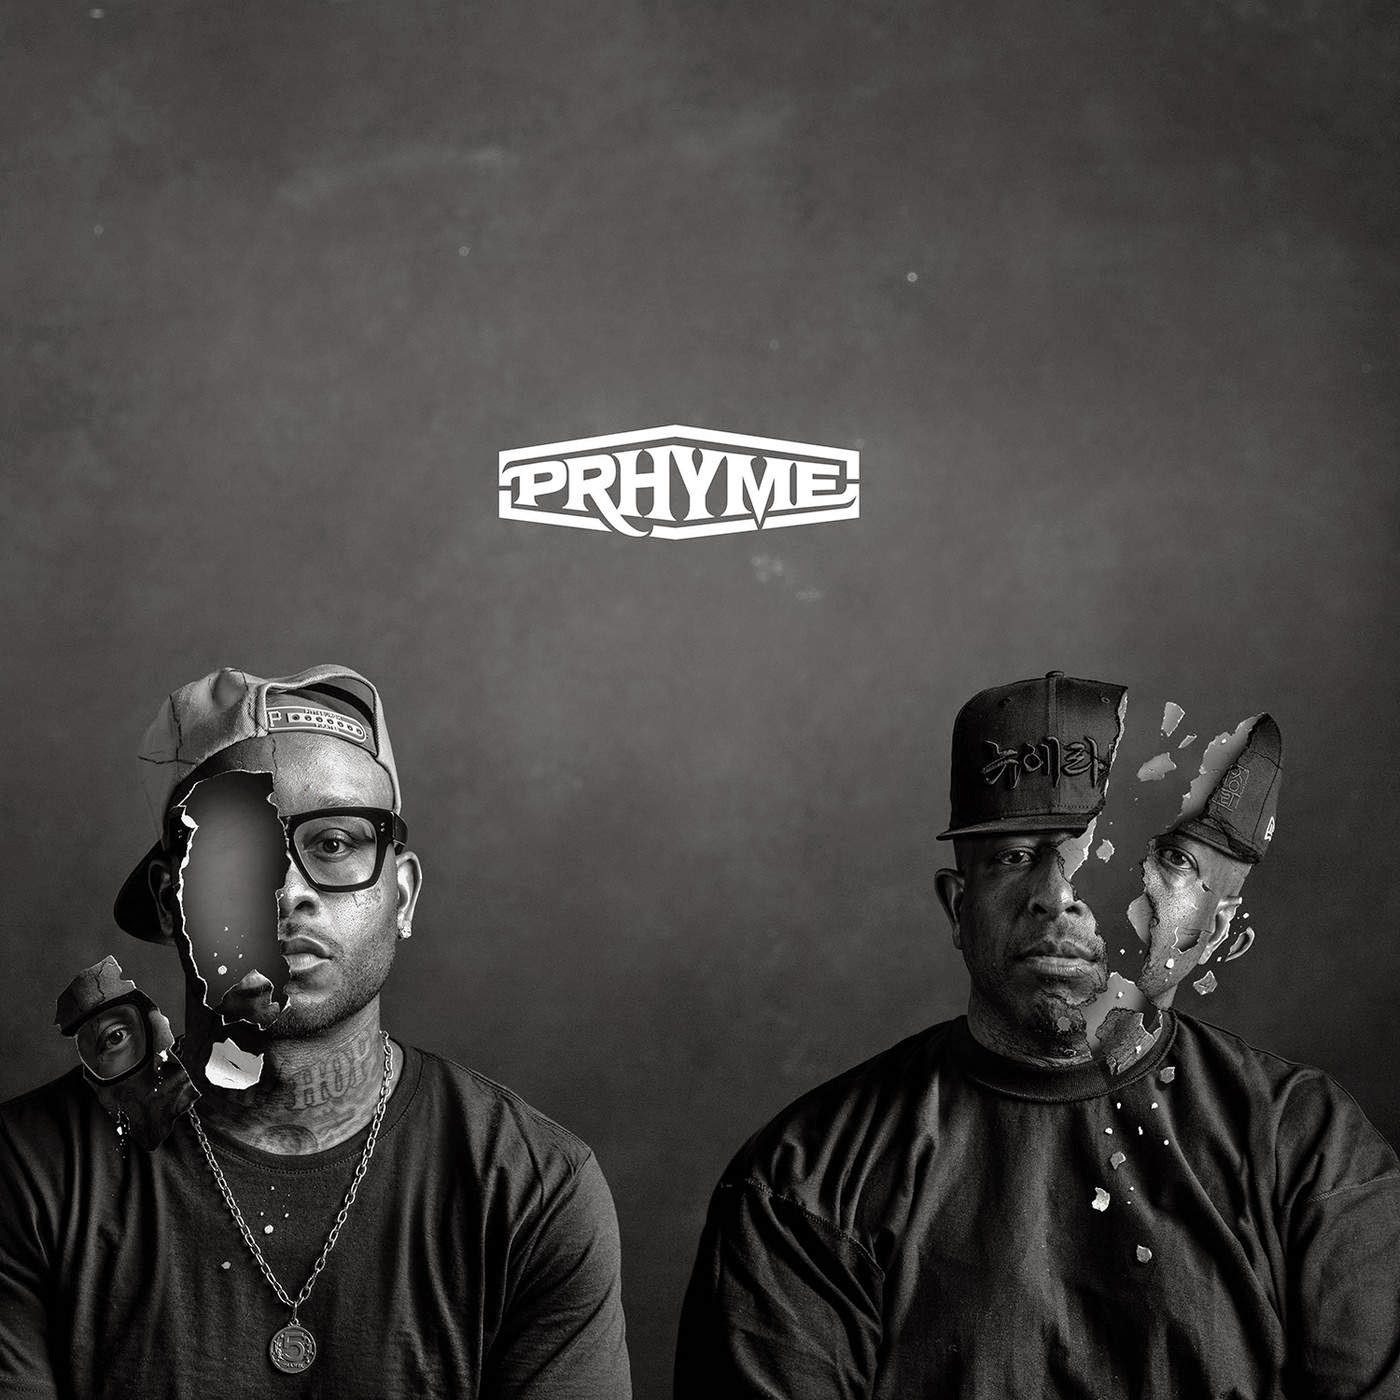 Prhyme - PRhyme Cover